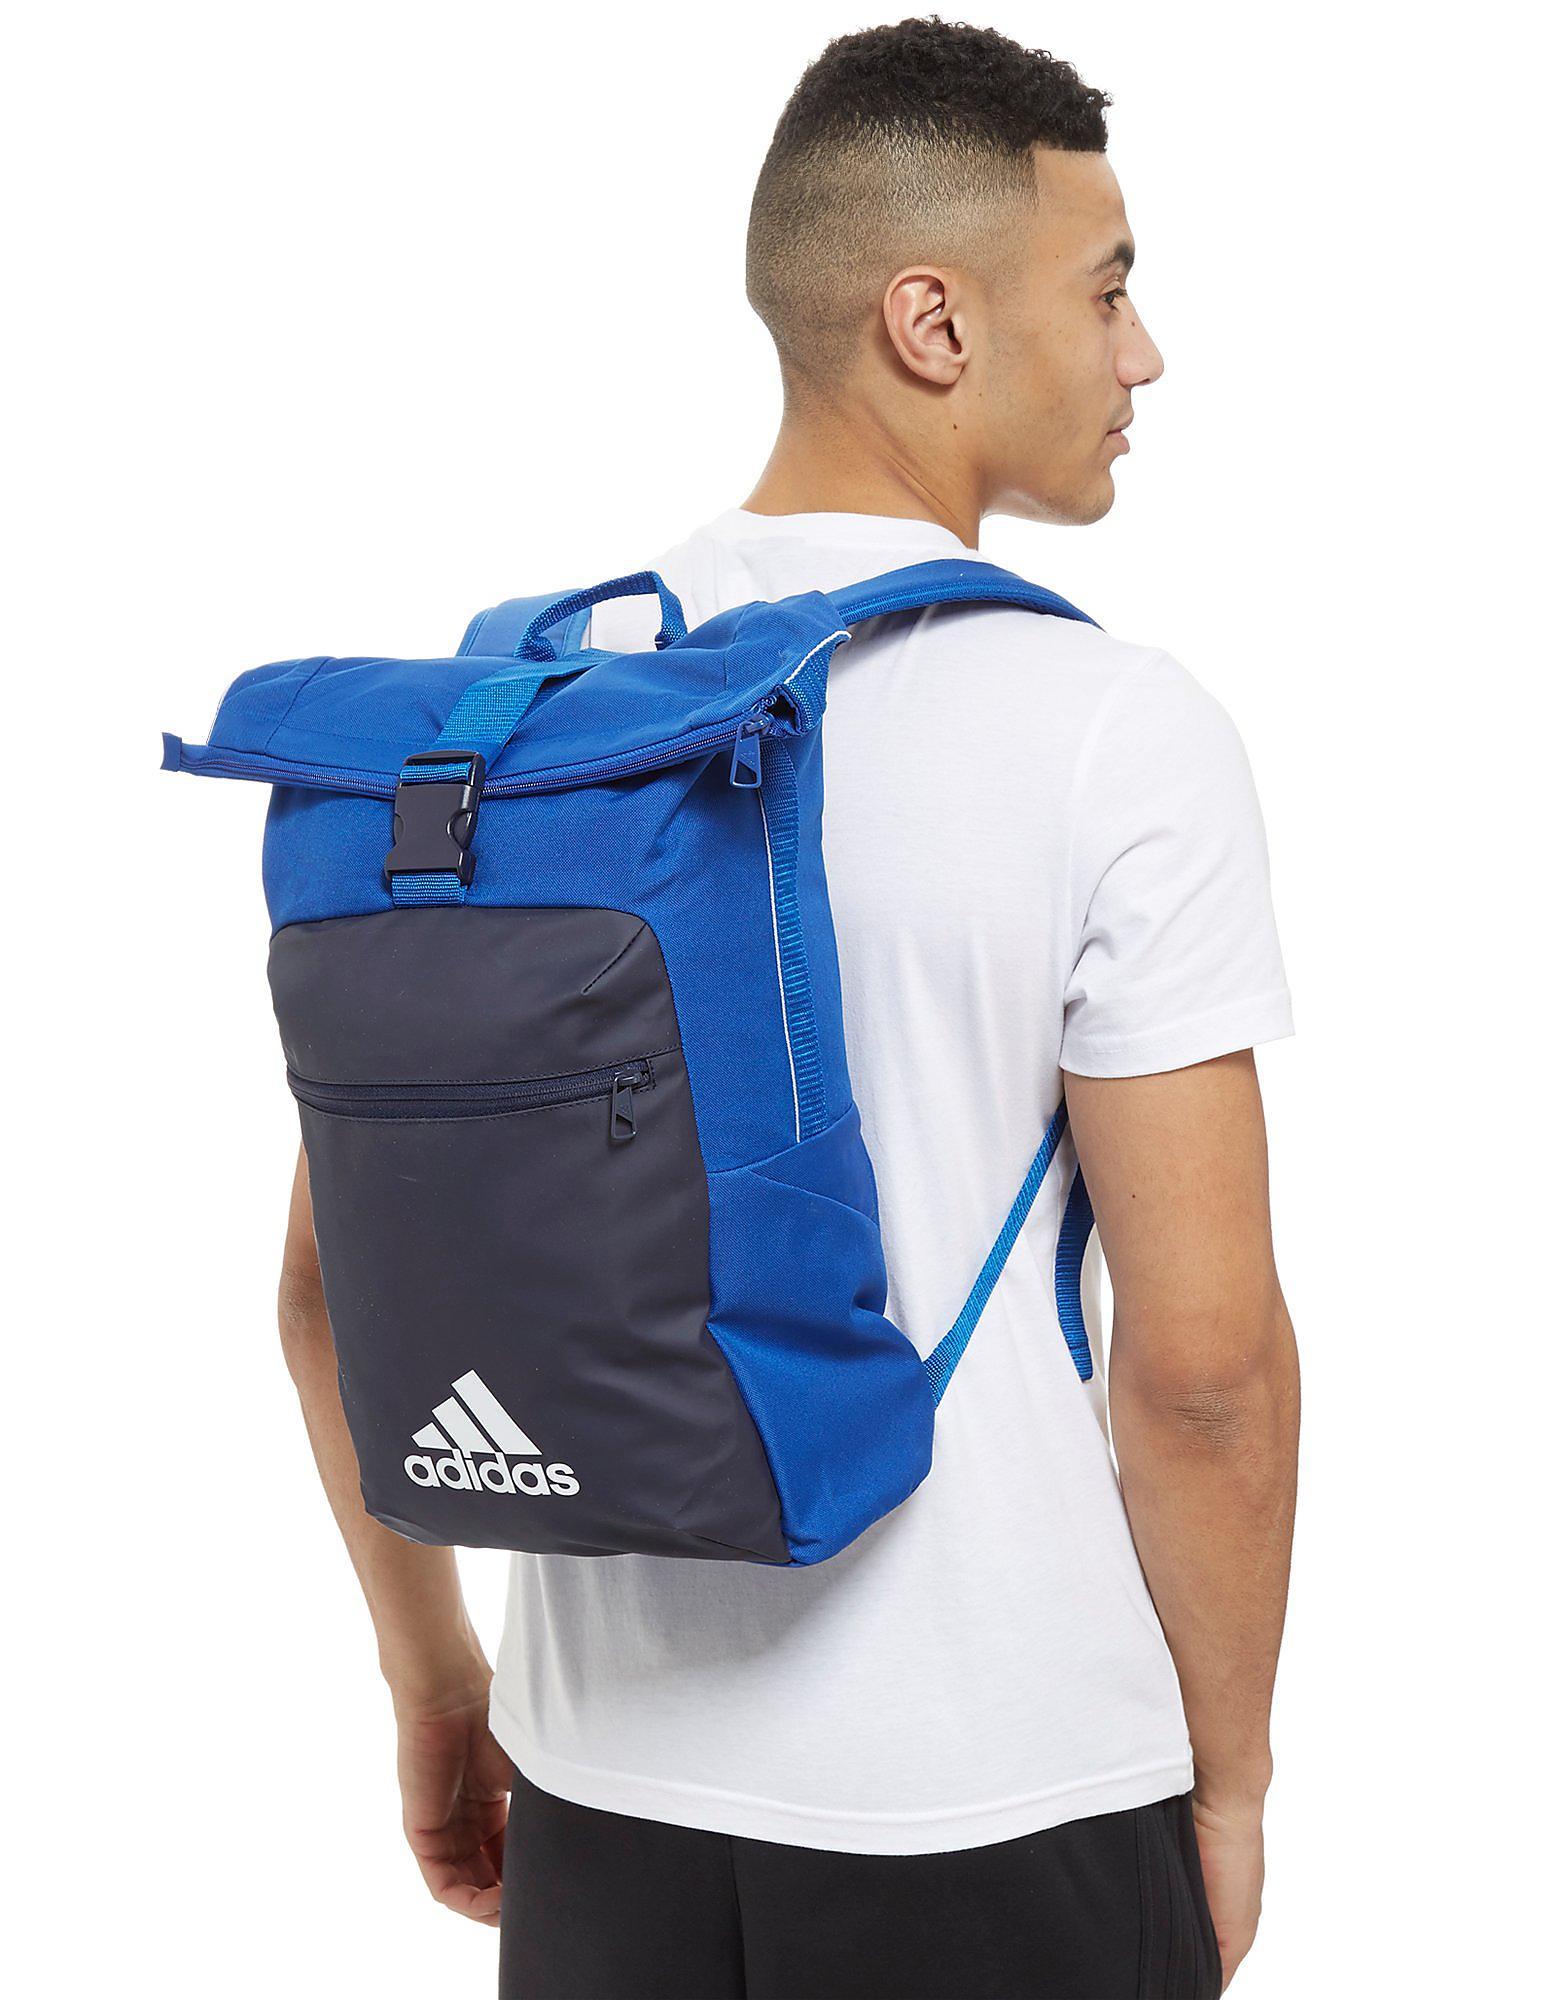 adidas Athletic Backpack